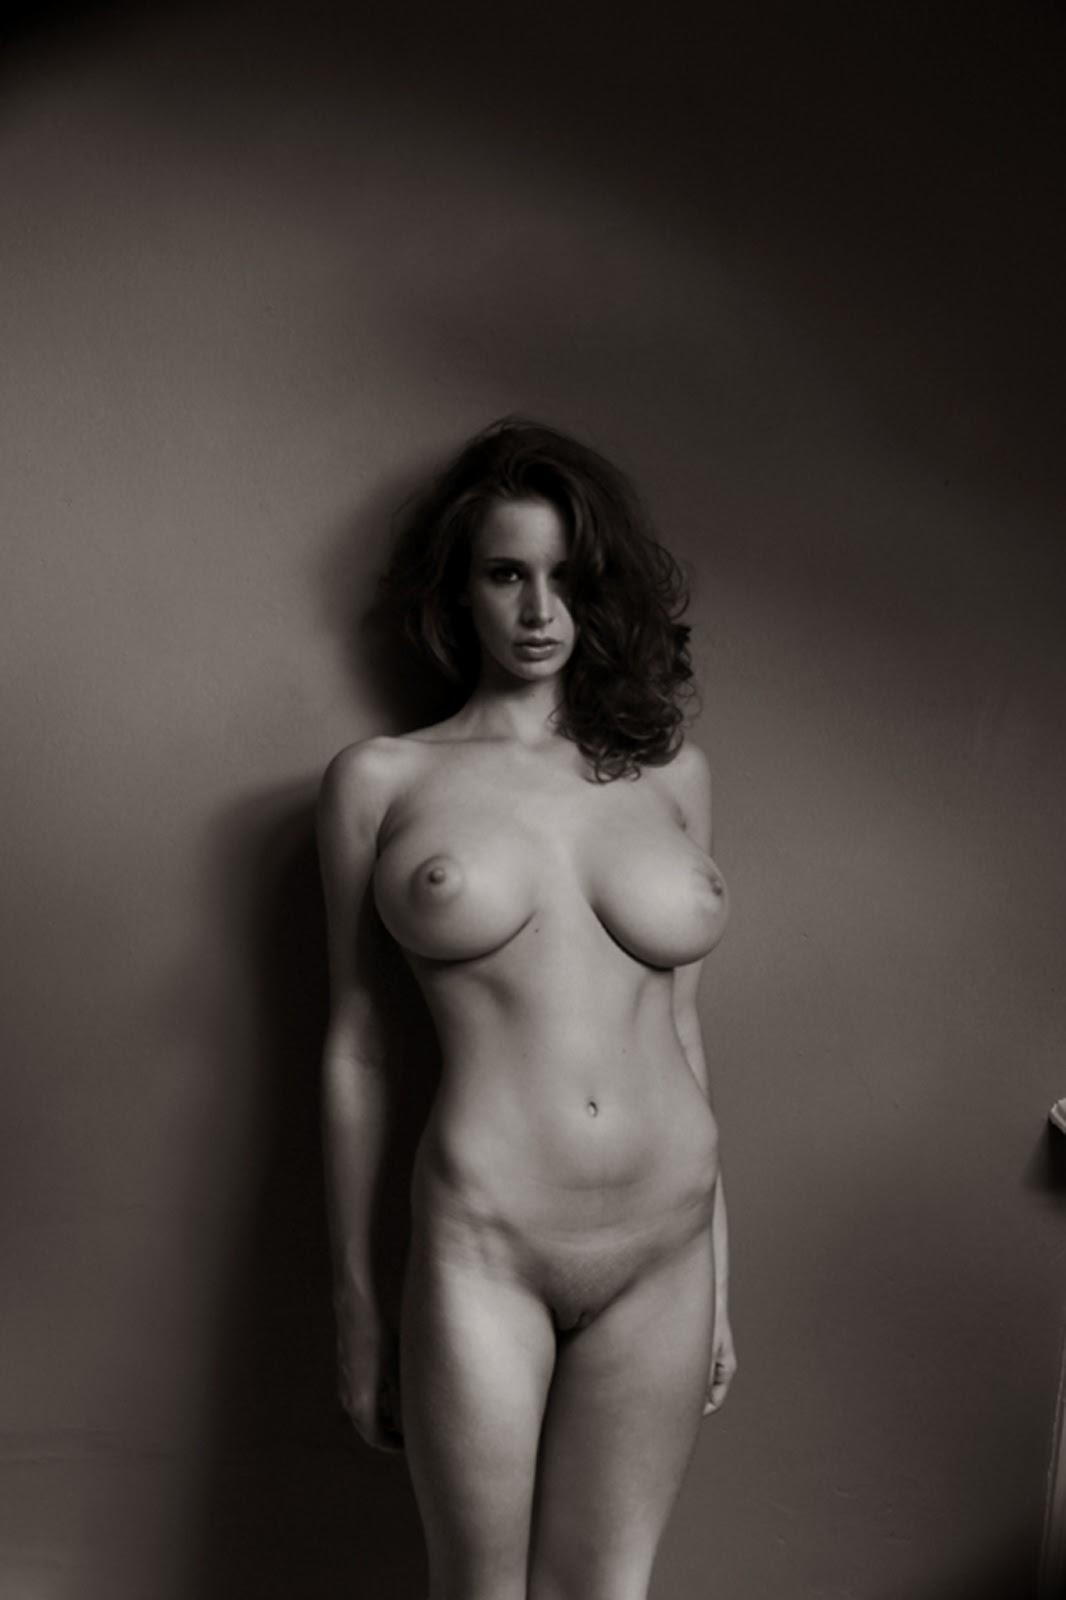 nackt Baker Emily Nathalie Baye